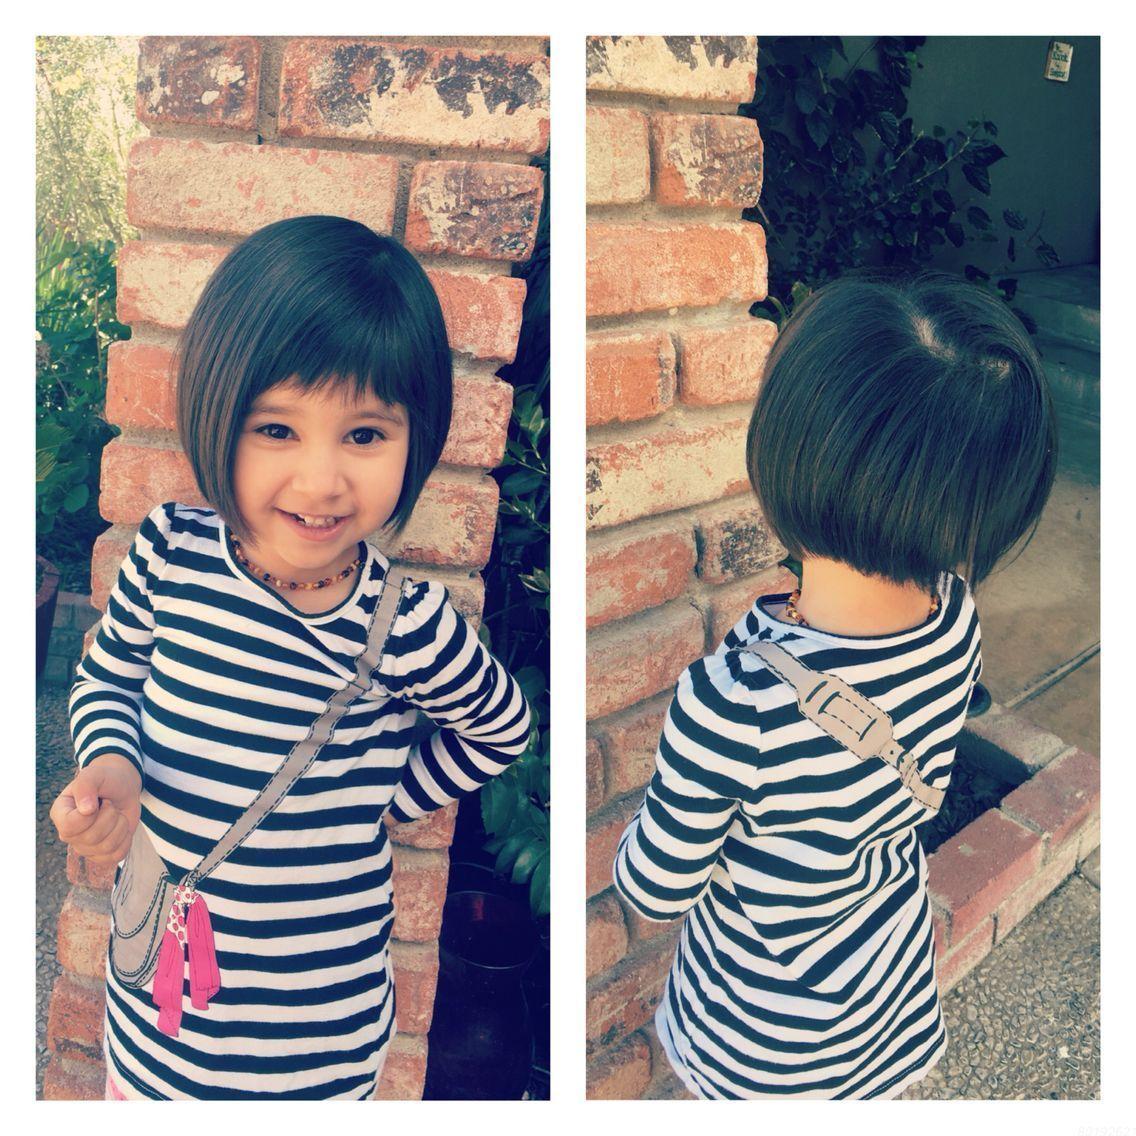 Hair Designs For Girls Cute Medium Haircuts Little Girl Hairstyle Images Little Girl Bob Haircut Little Girl Hairstyles Little Girl Haircuts